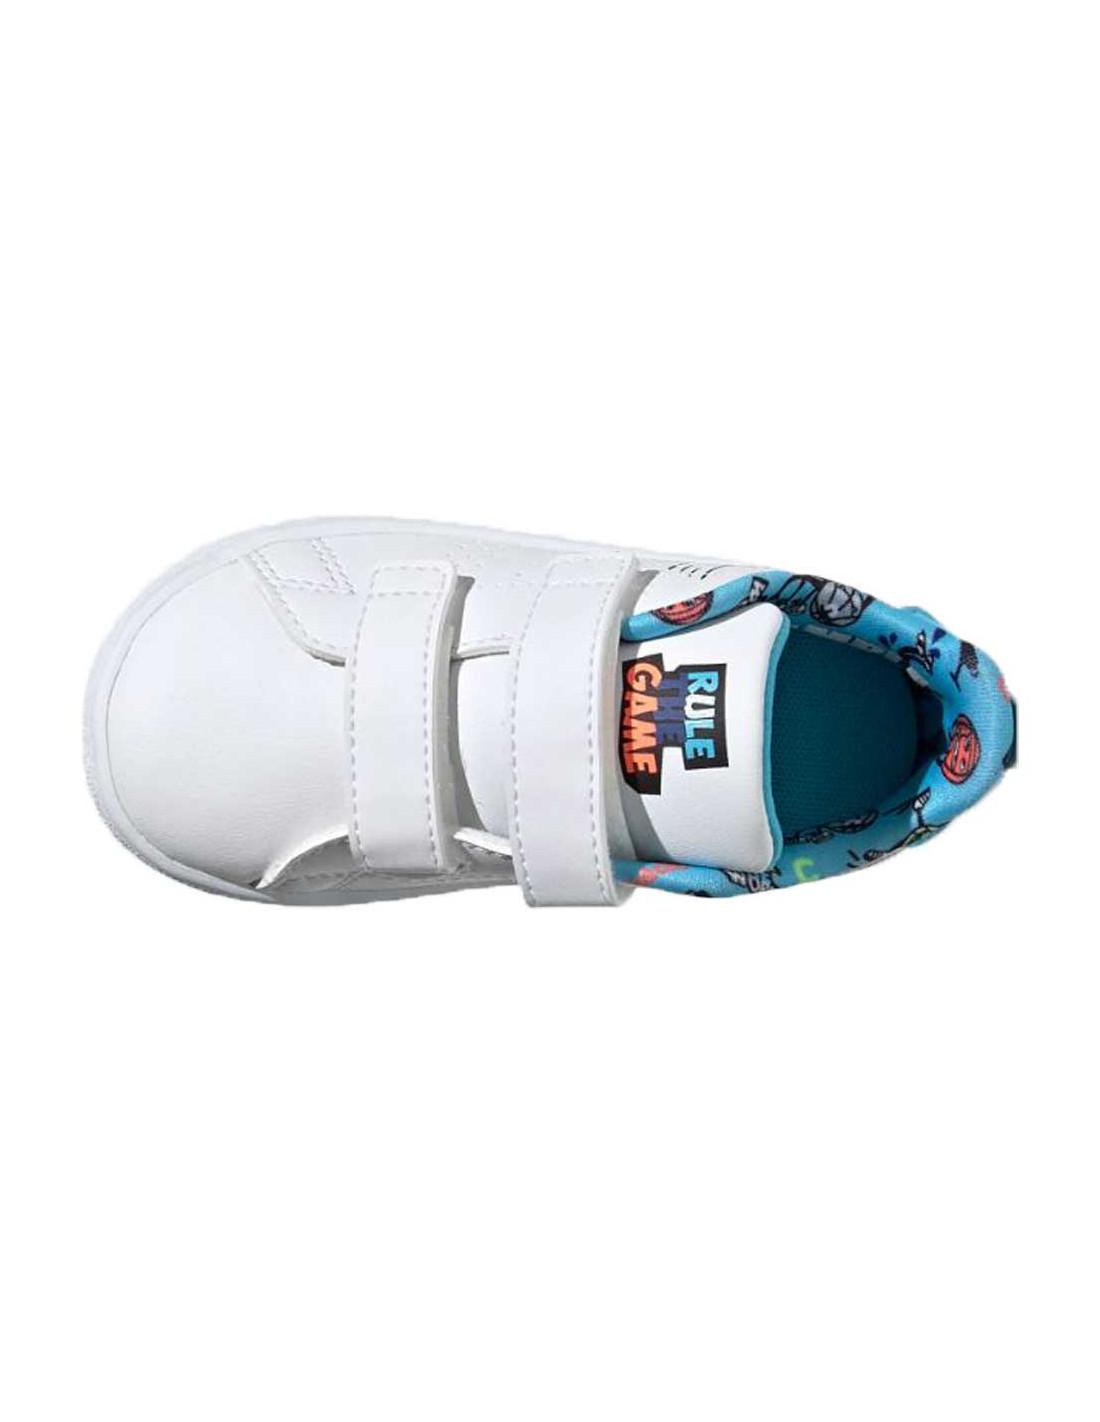 scarpe adidas bambino bianche e celesti